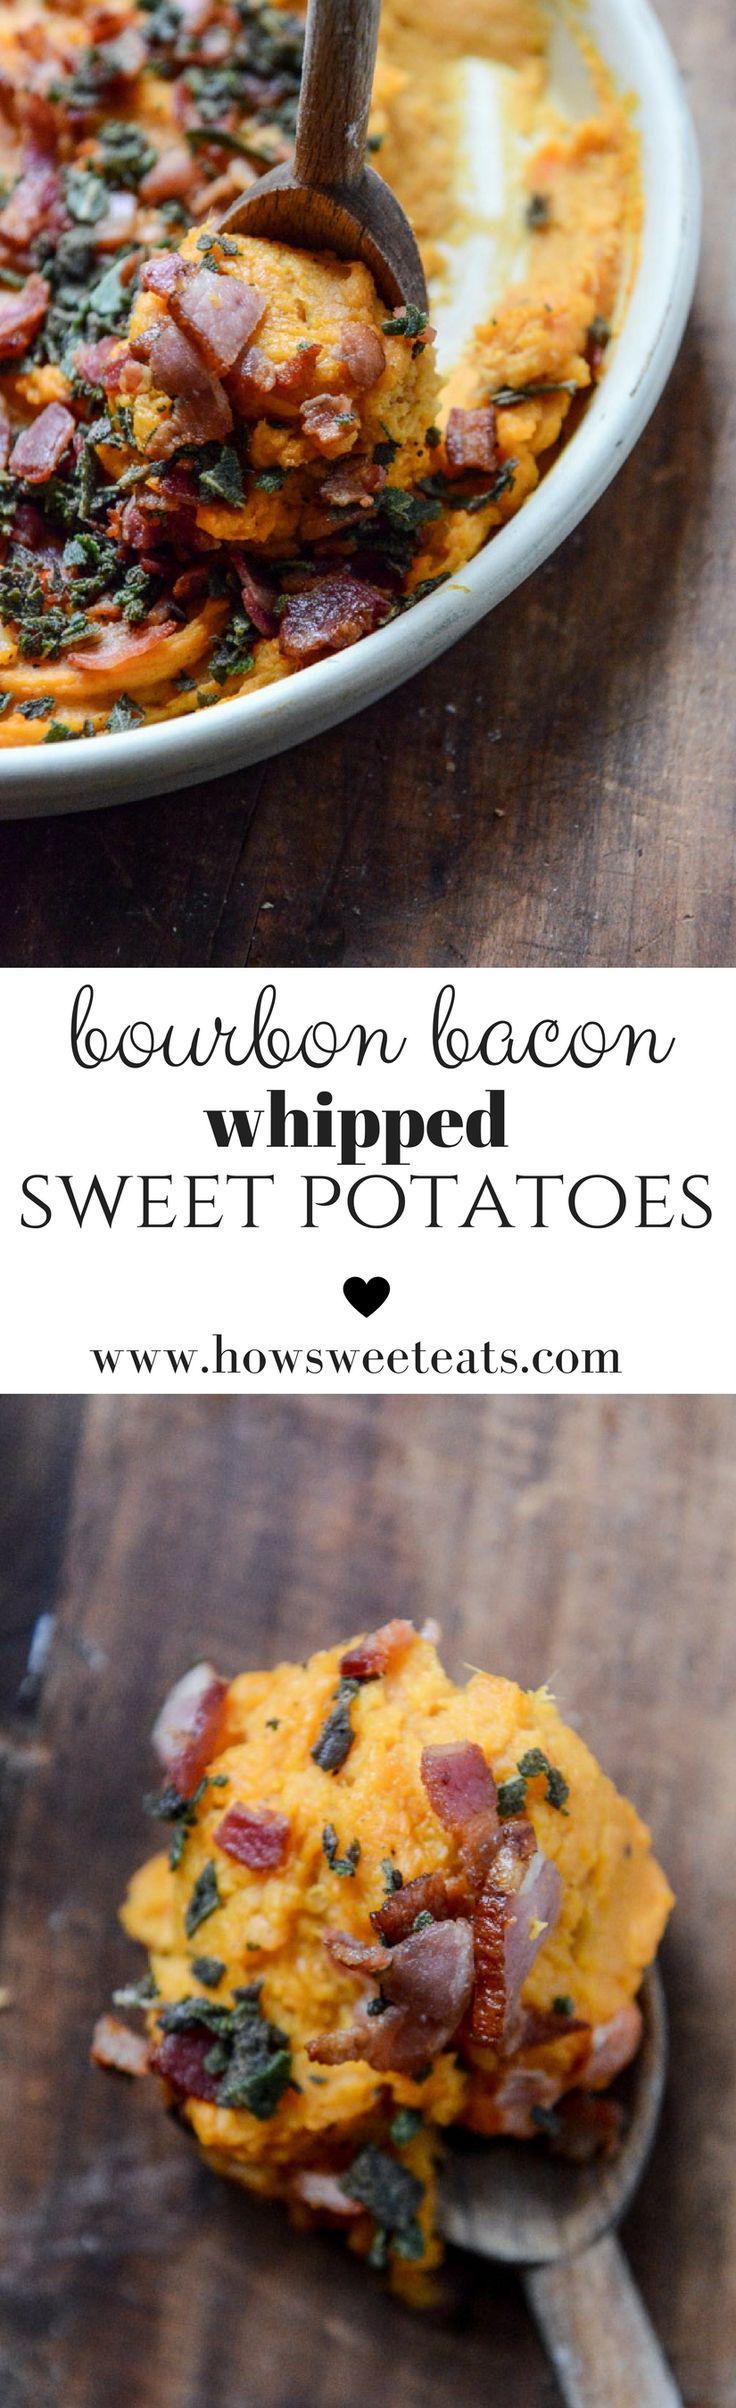 bourbon bacon whipped sweet potatoes I howsweeteats.com